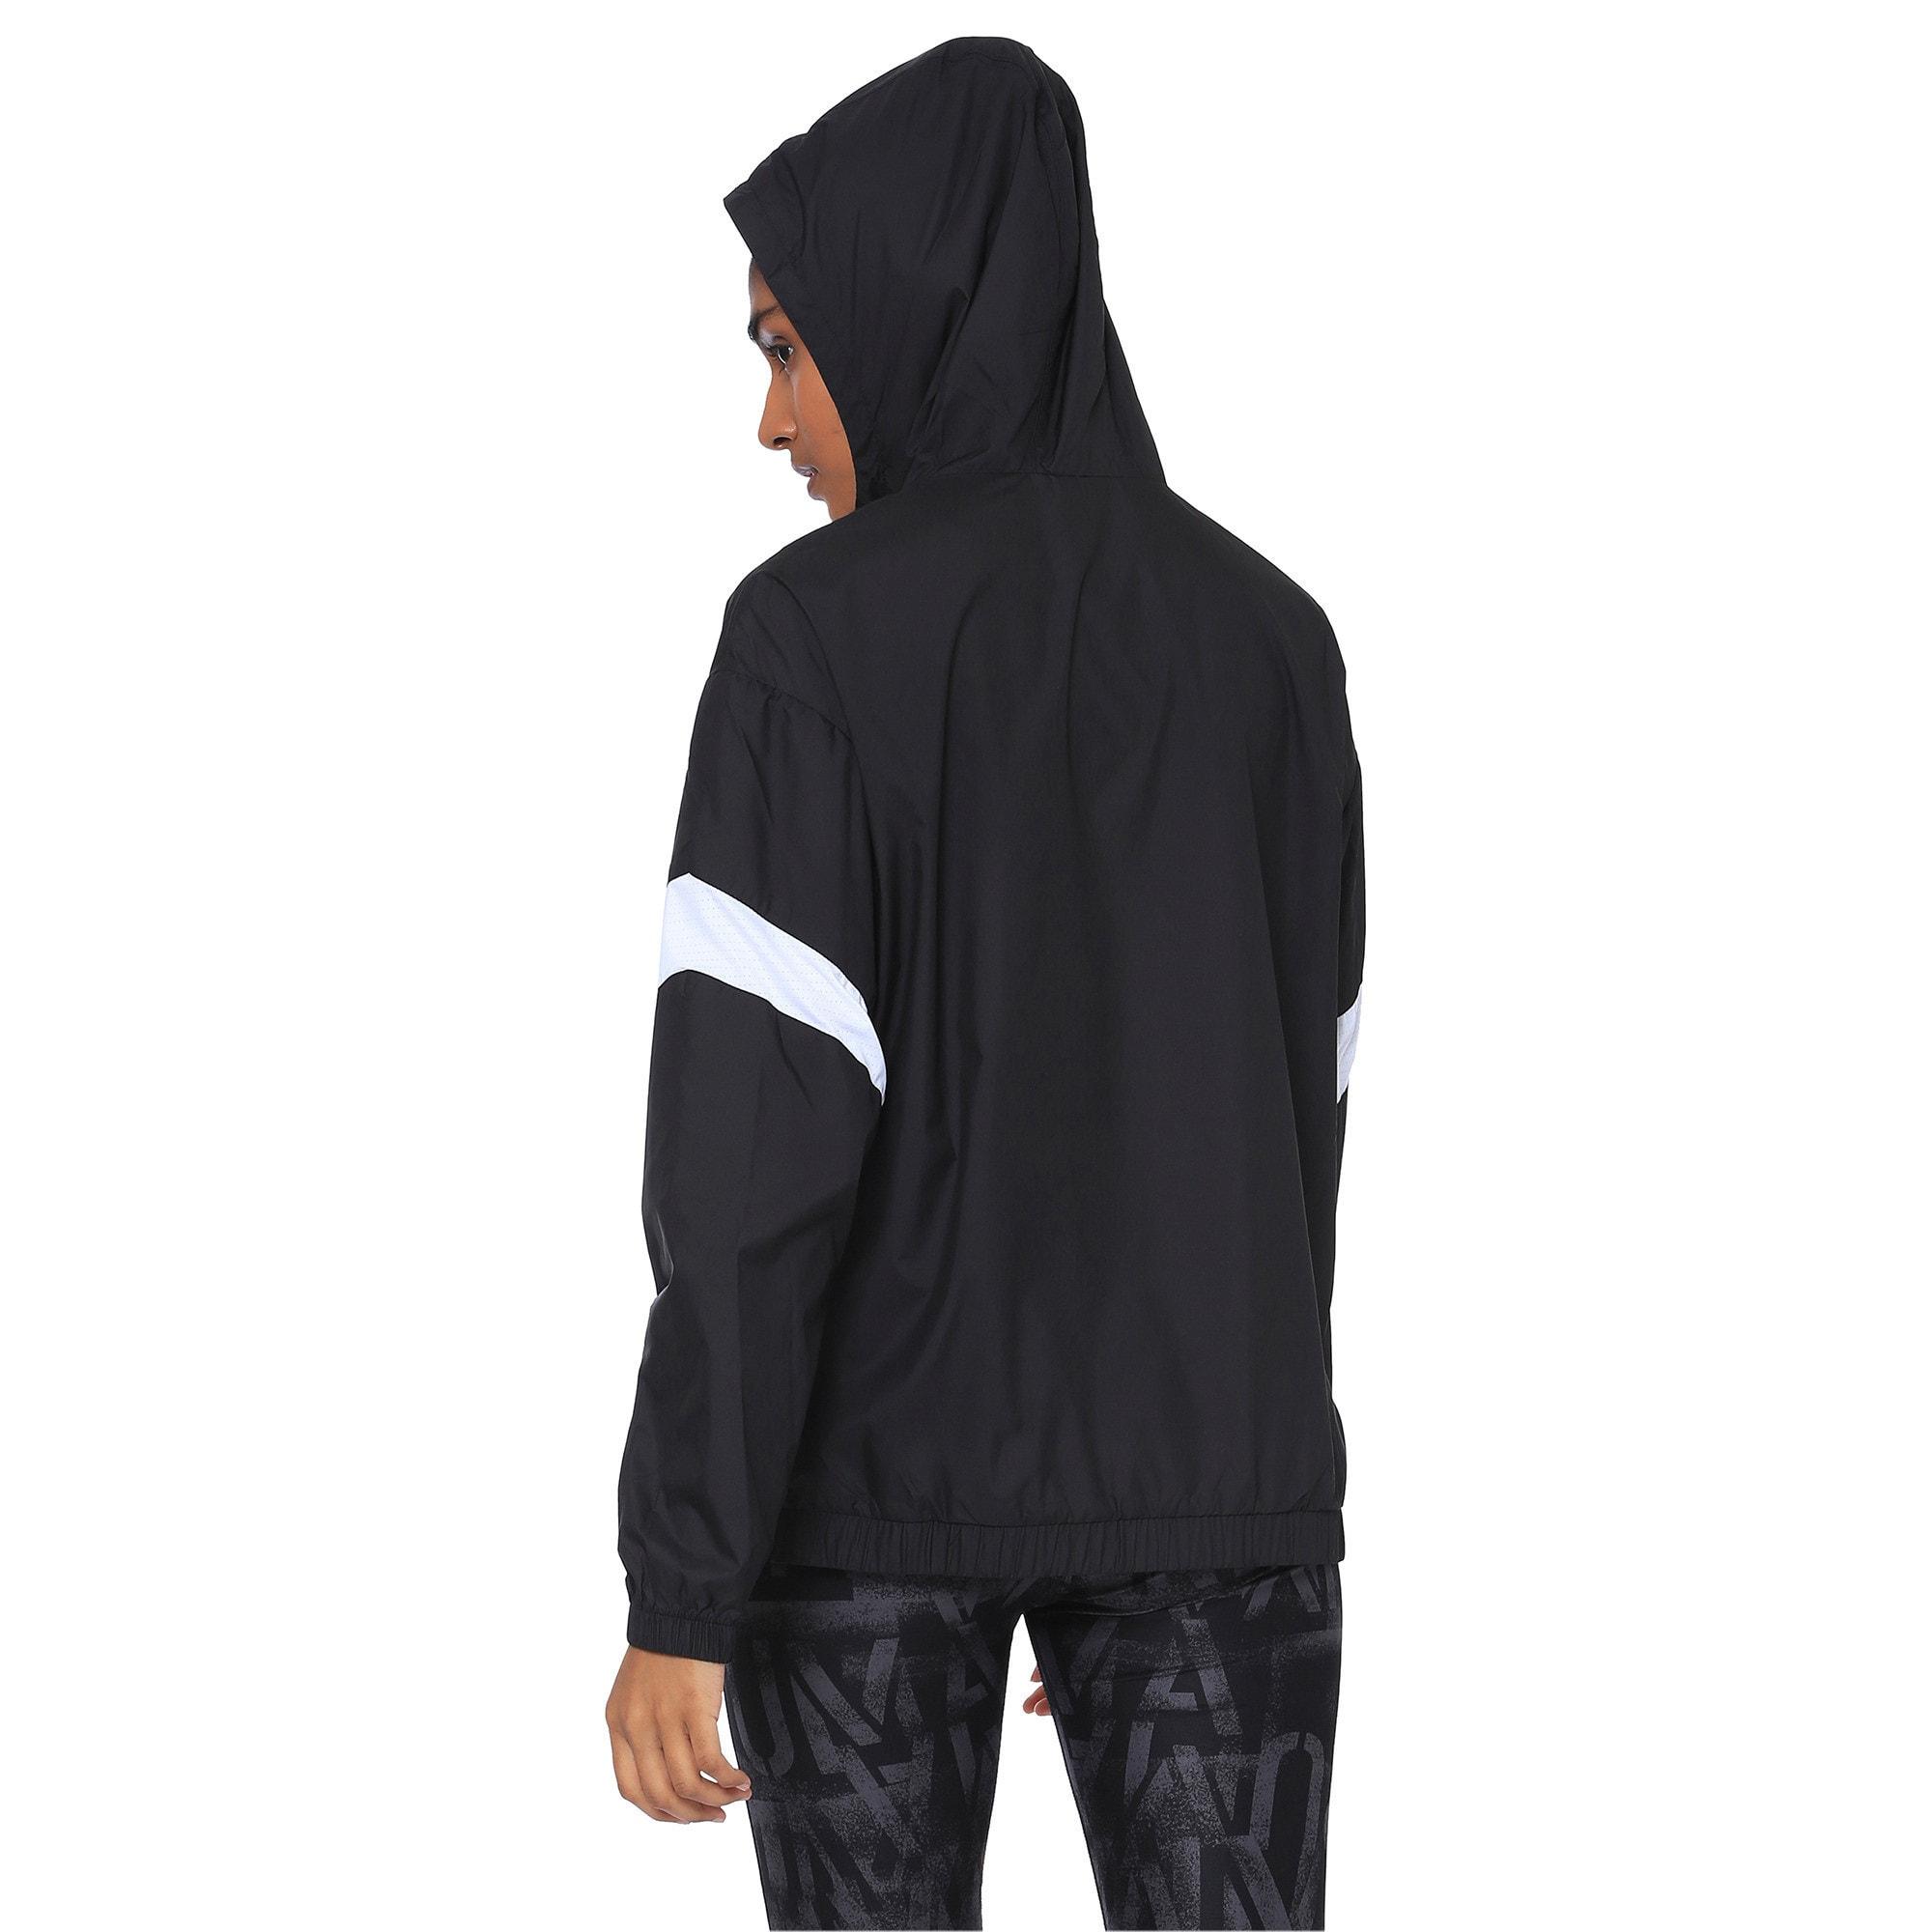 Thumbnail 1 of A.C.E Half Zip Hooded Women's Jacket, Puma Black-Puma White, medium-IND